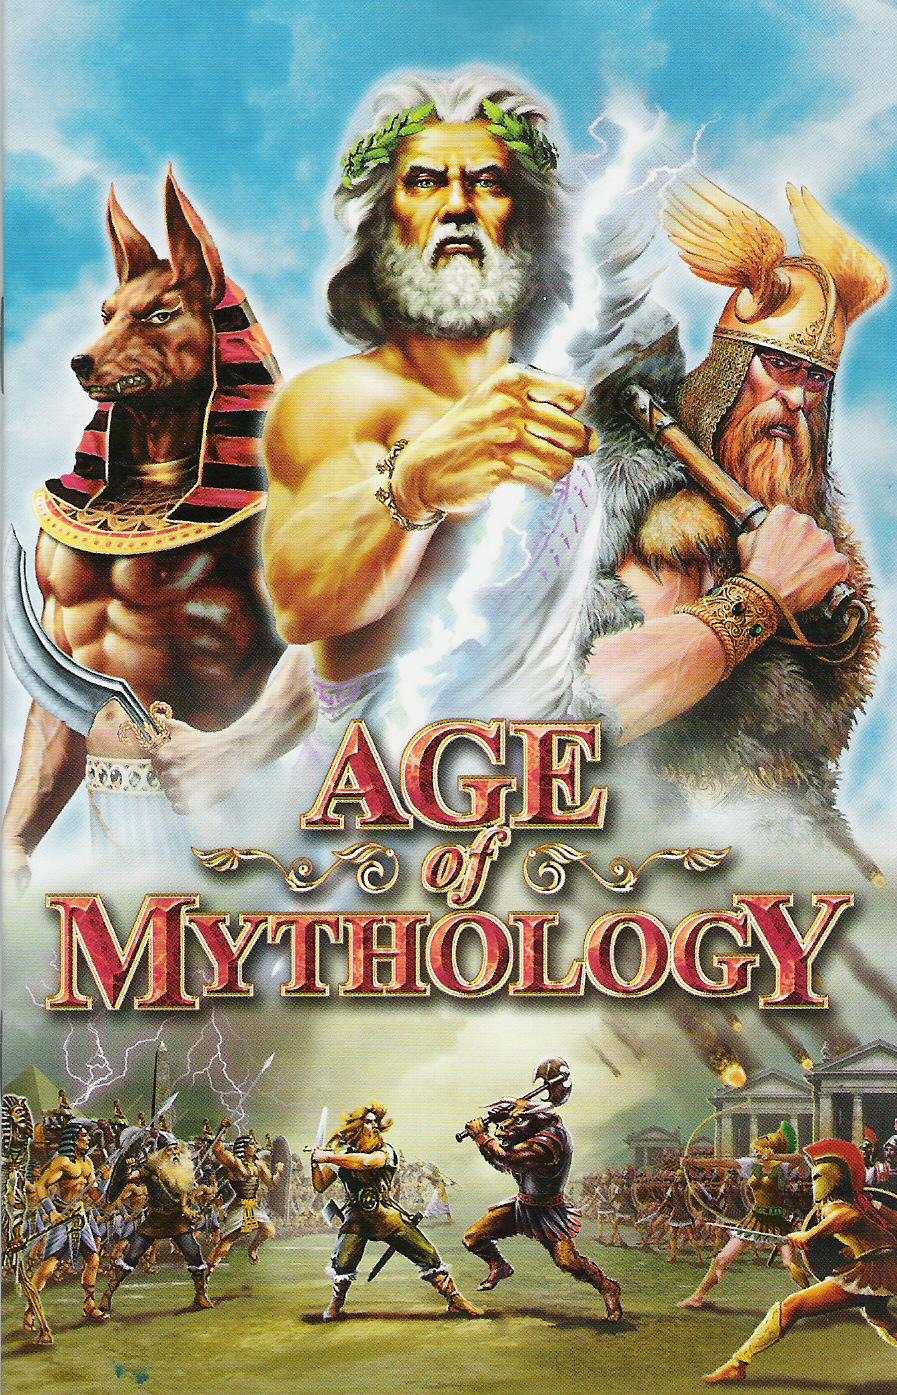 norse mythology vs greek mythology essay History other essays: norse mythology vs greek mythology norse mythology vs greek mythology this research paper norse mythology vsgreek mythology and other 63,000+ term papers, college.